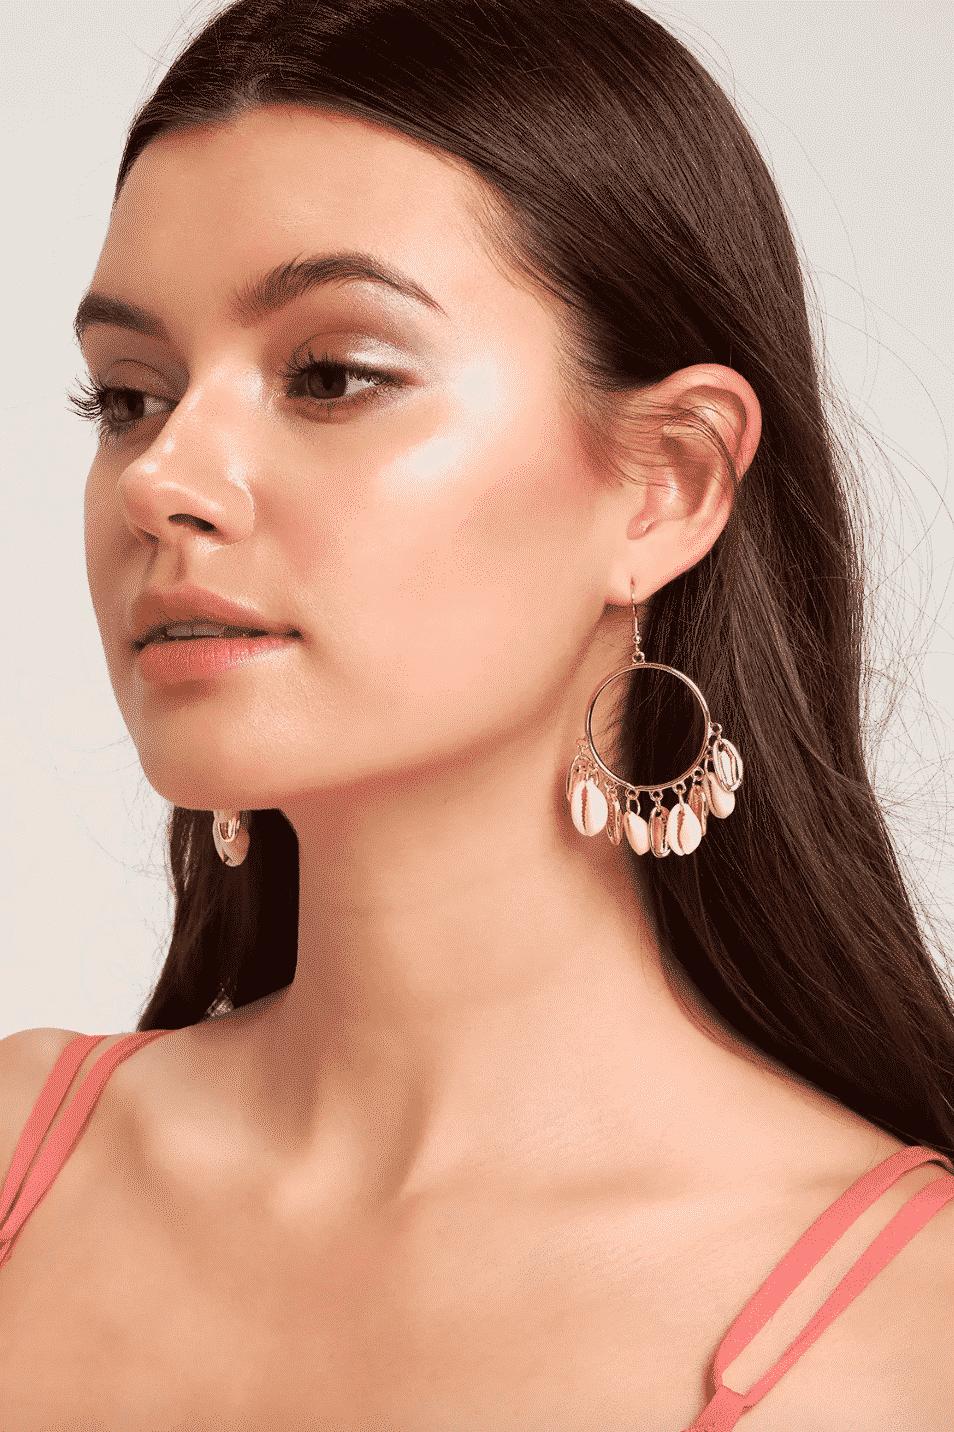 Shell earrings - spring 2019 jewelry trends